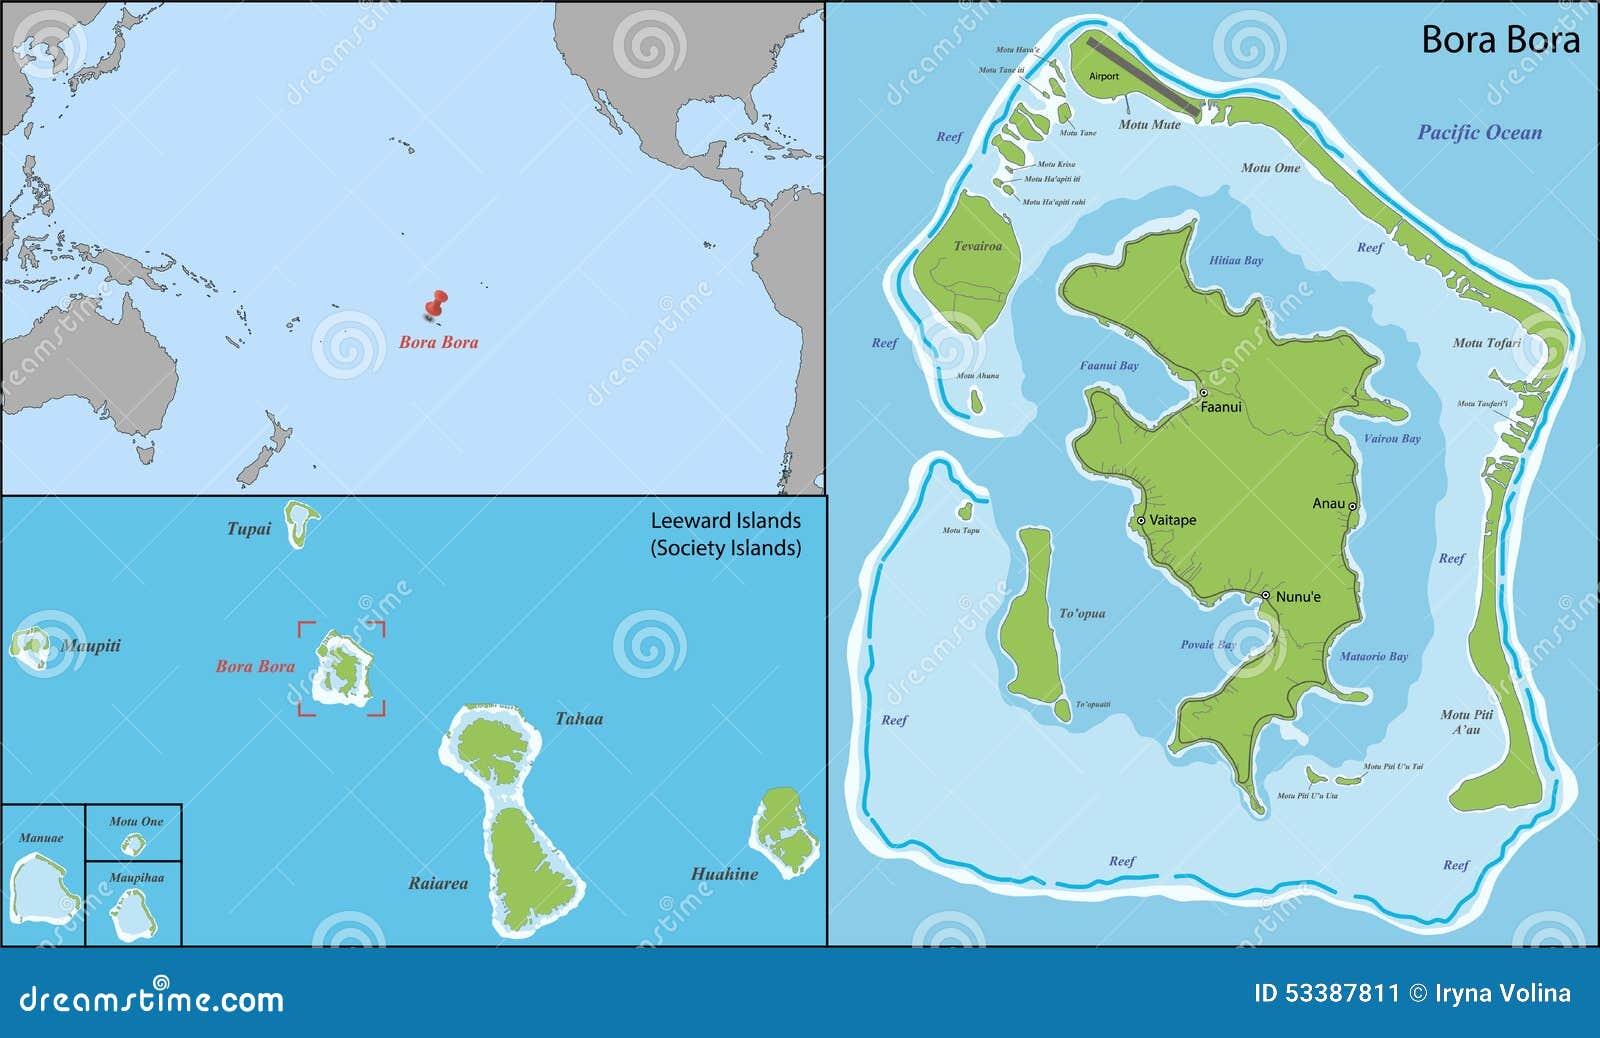 location of bora bora on world map #6, engine diagram, location of bora bora on world map